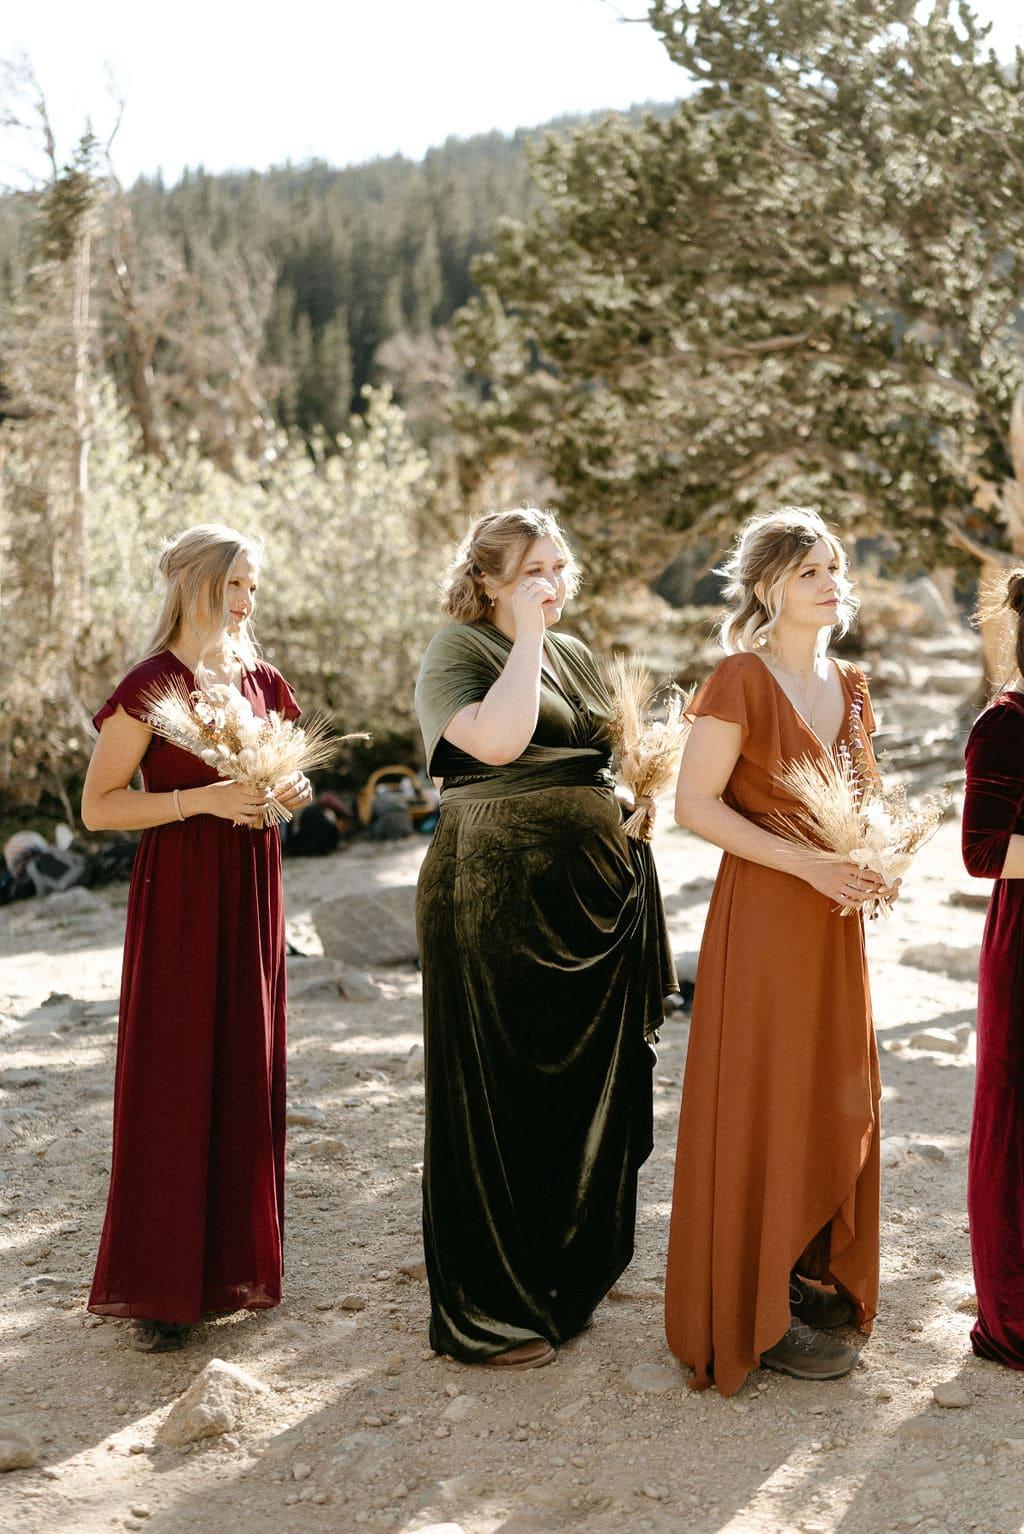 Sister crys at wedding in colorado